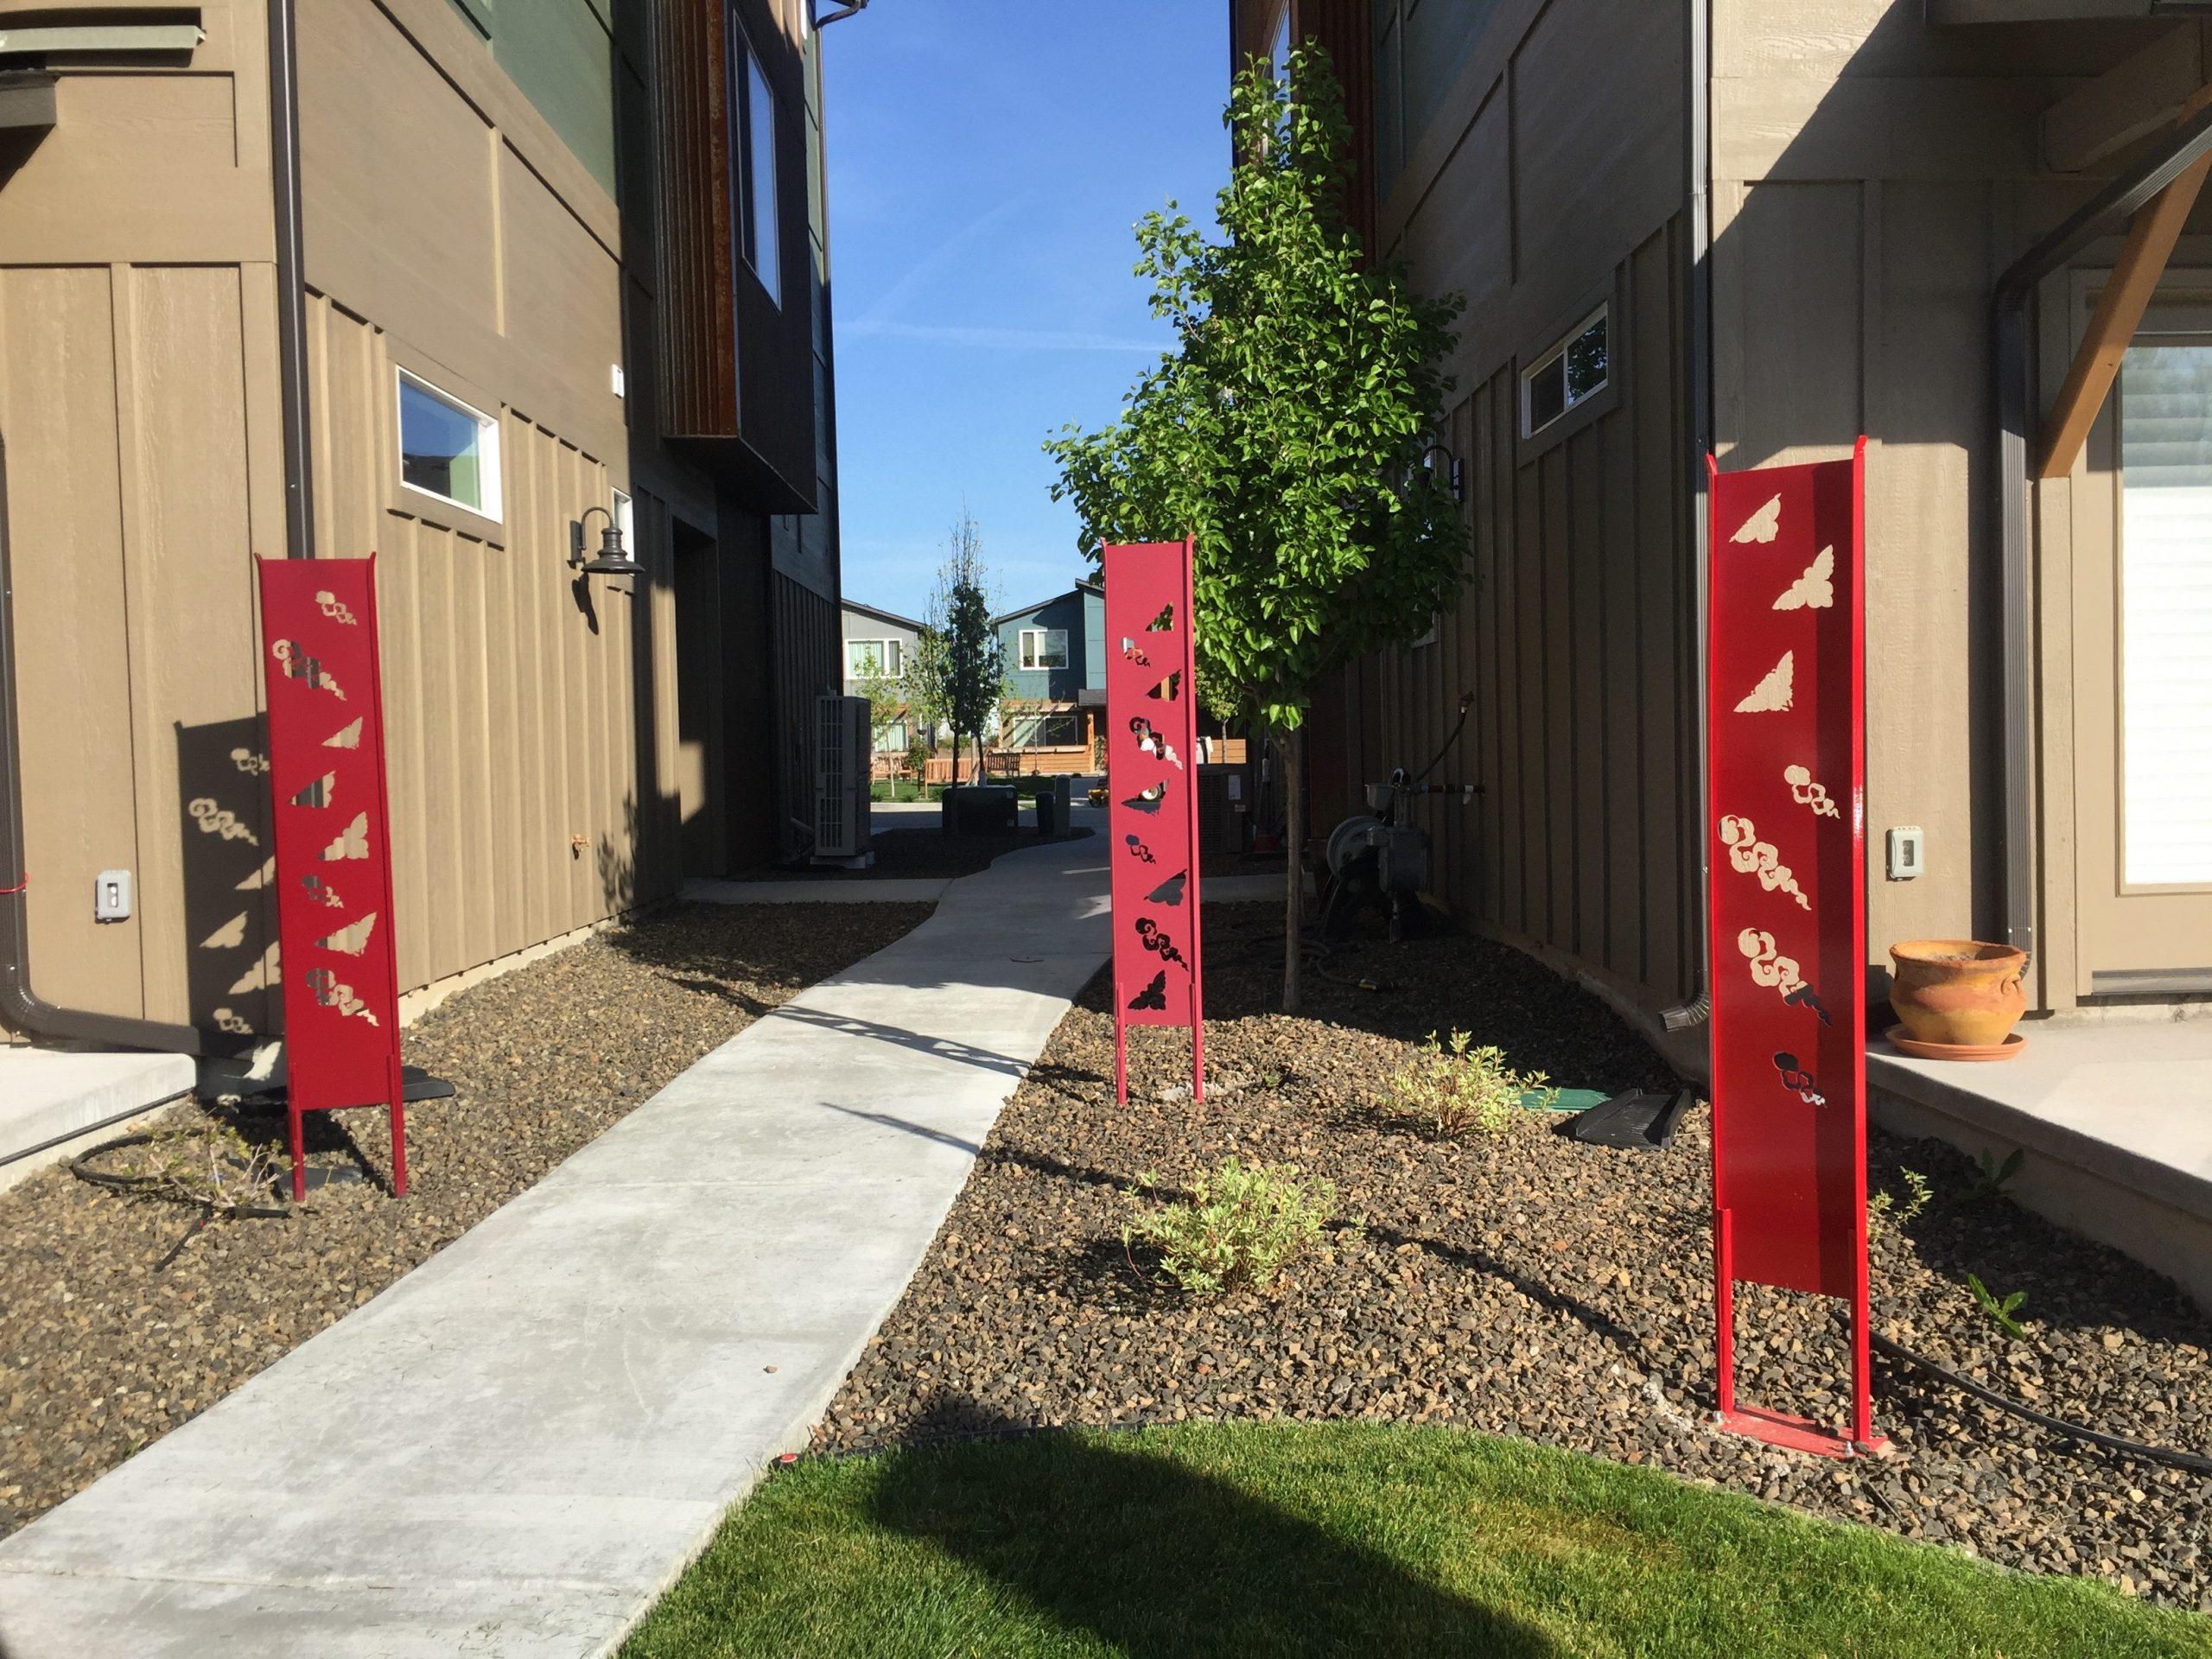 NeighborWorks Boise: 34th Street